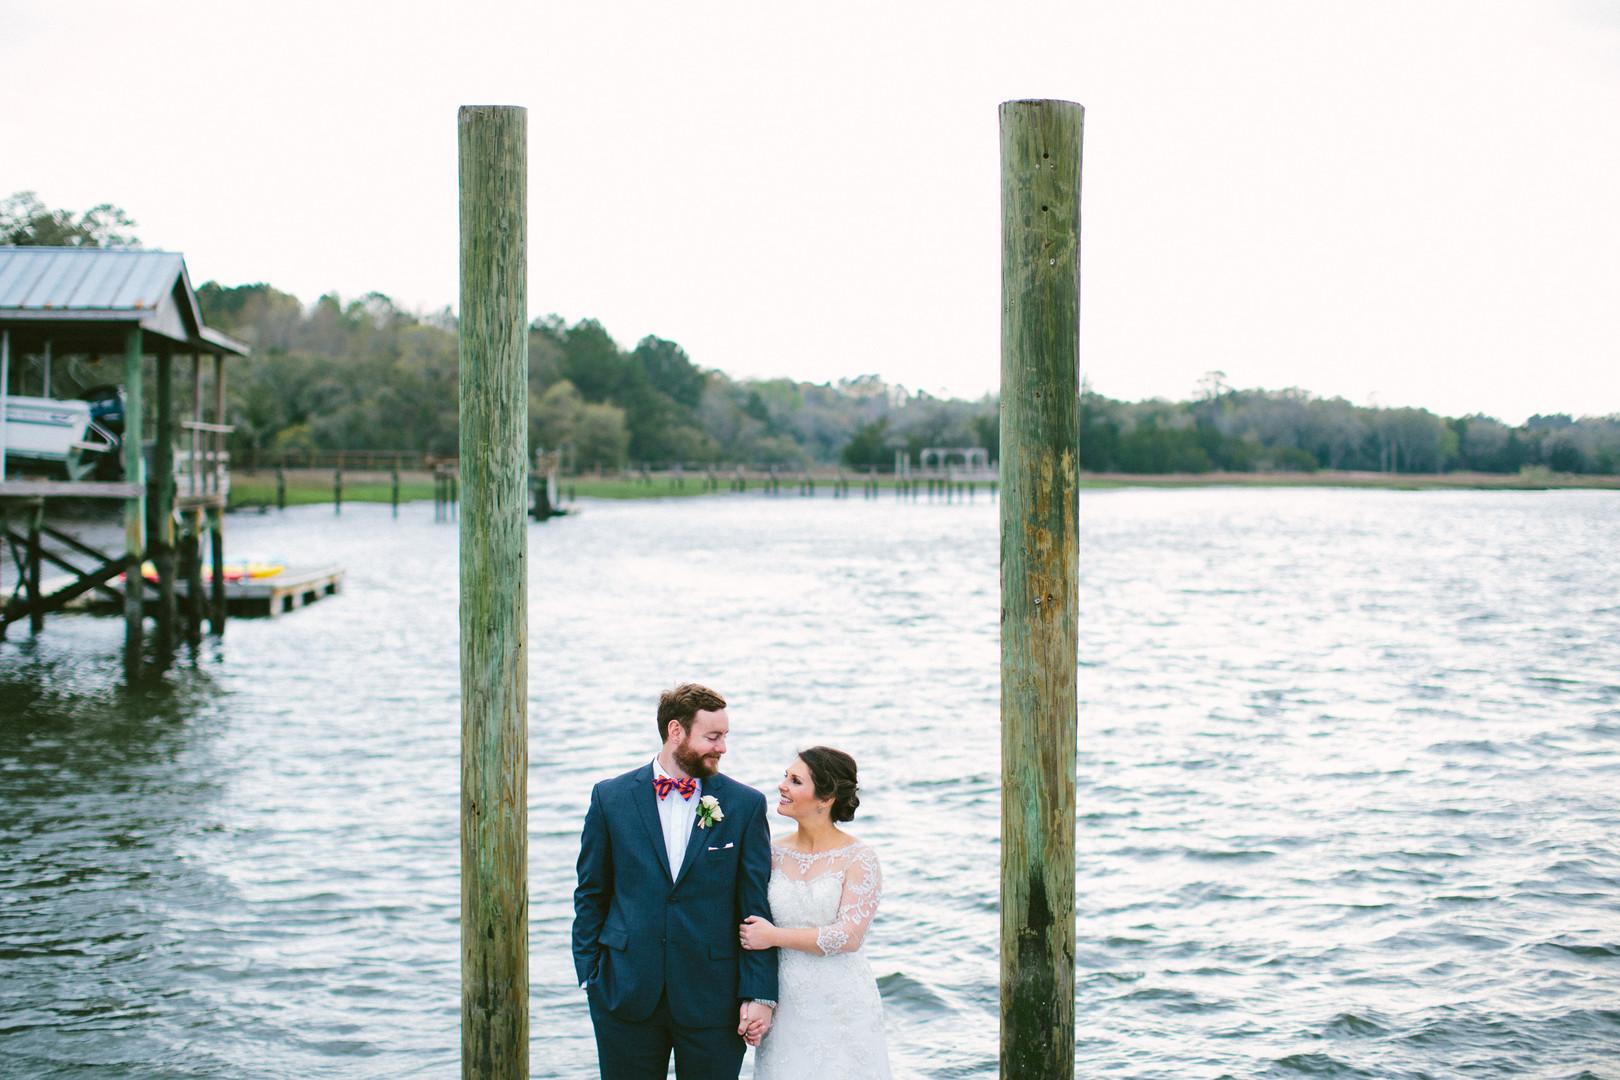 oak-point-plantation-wedding-29.jpg